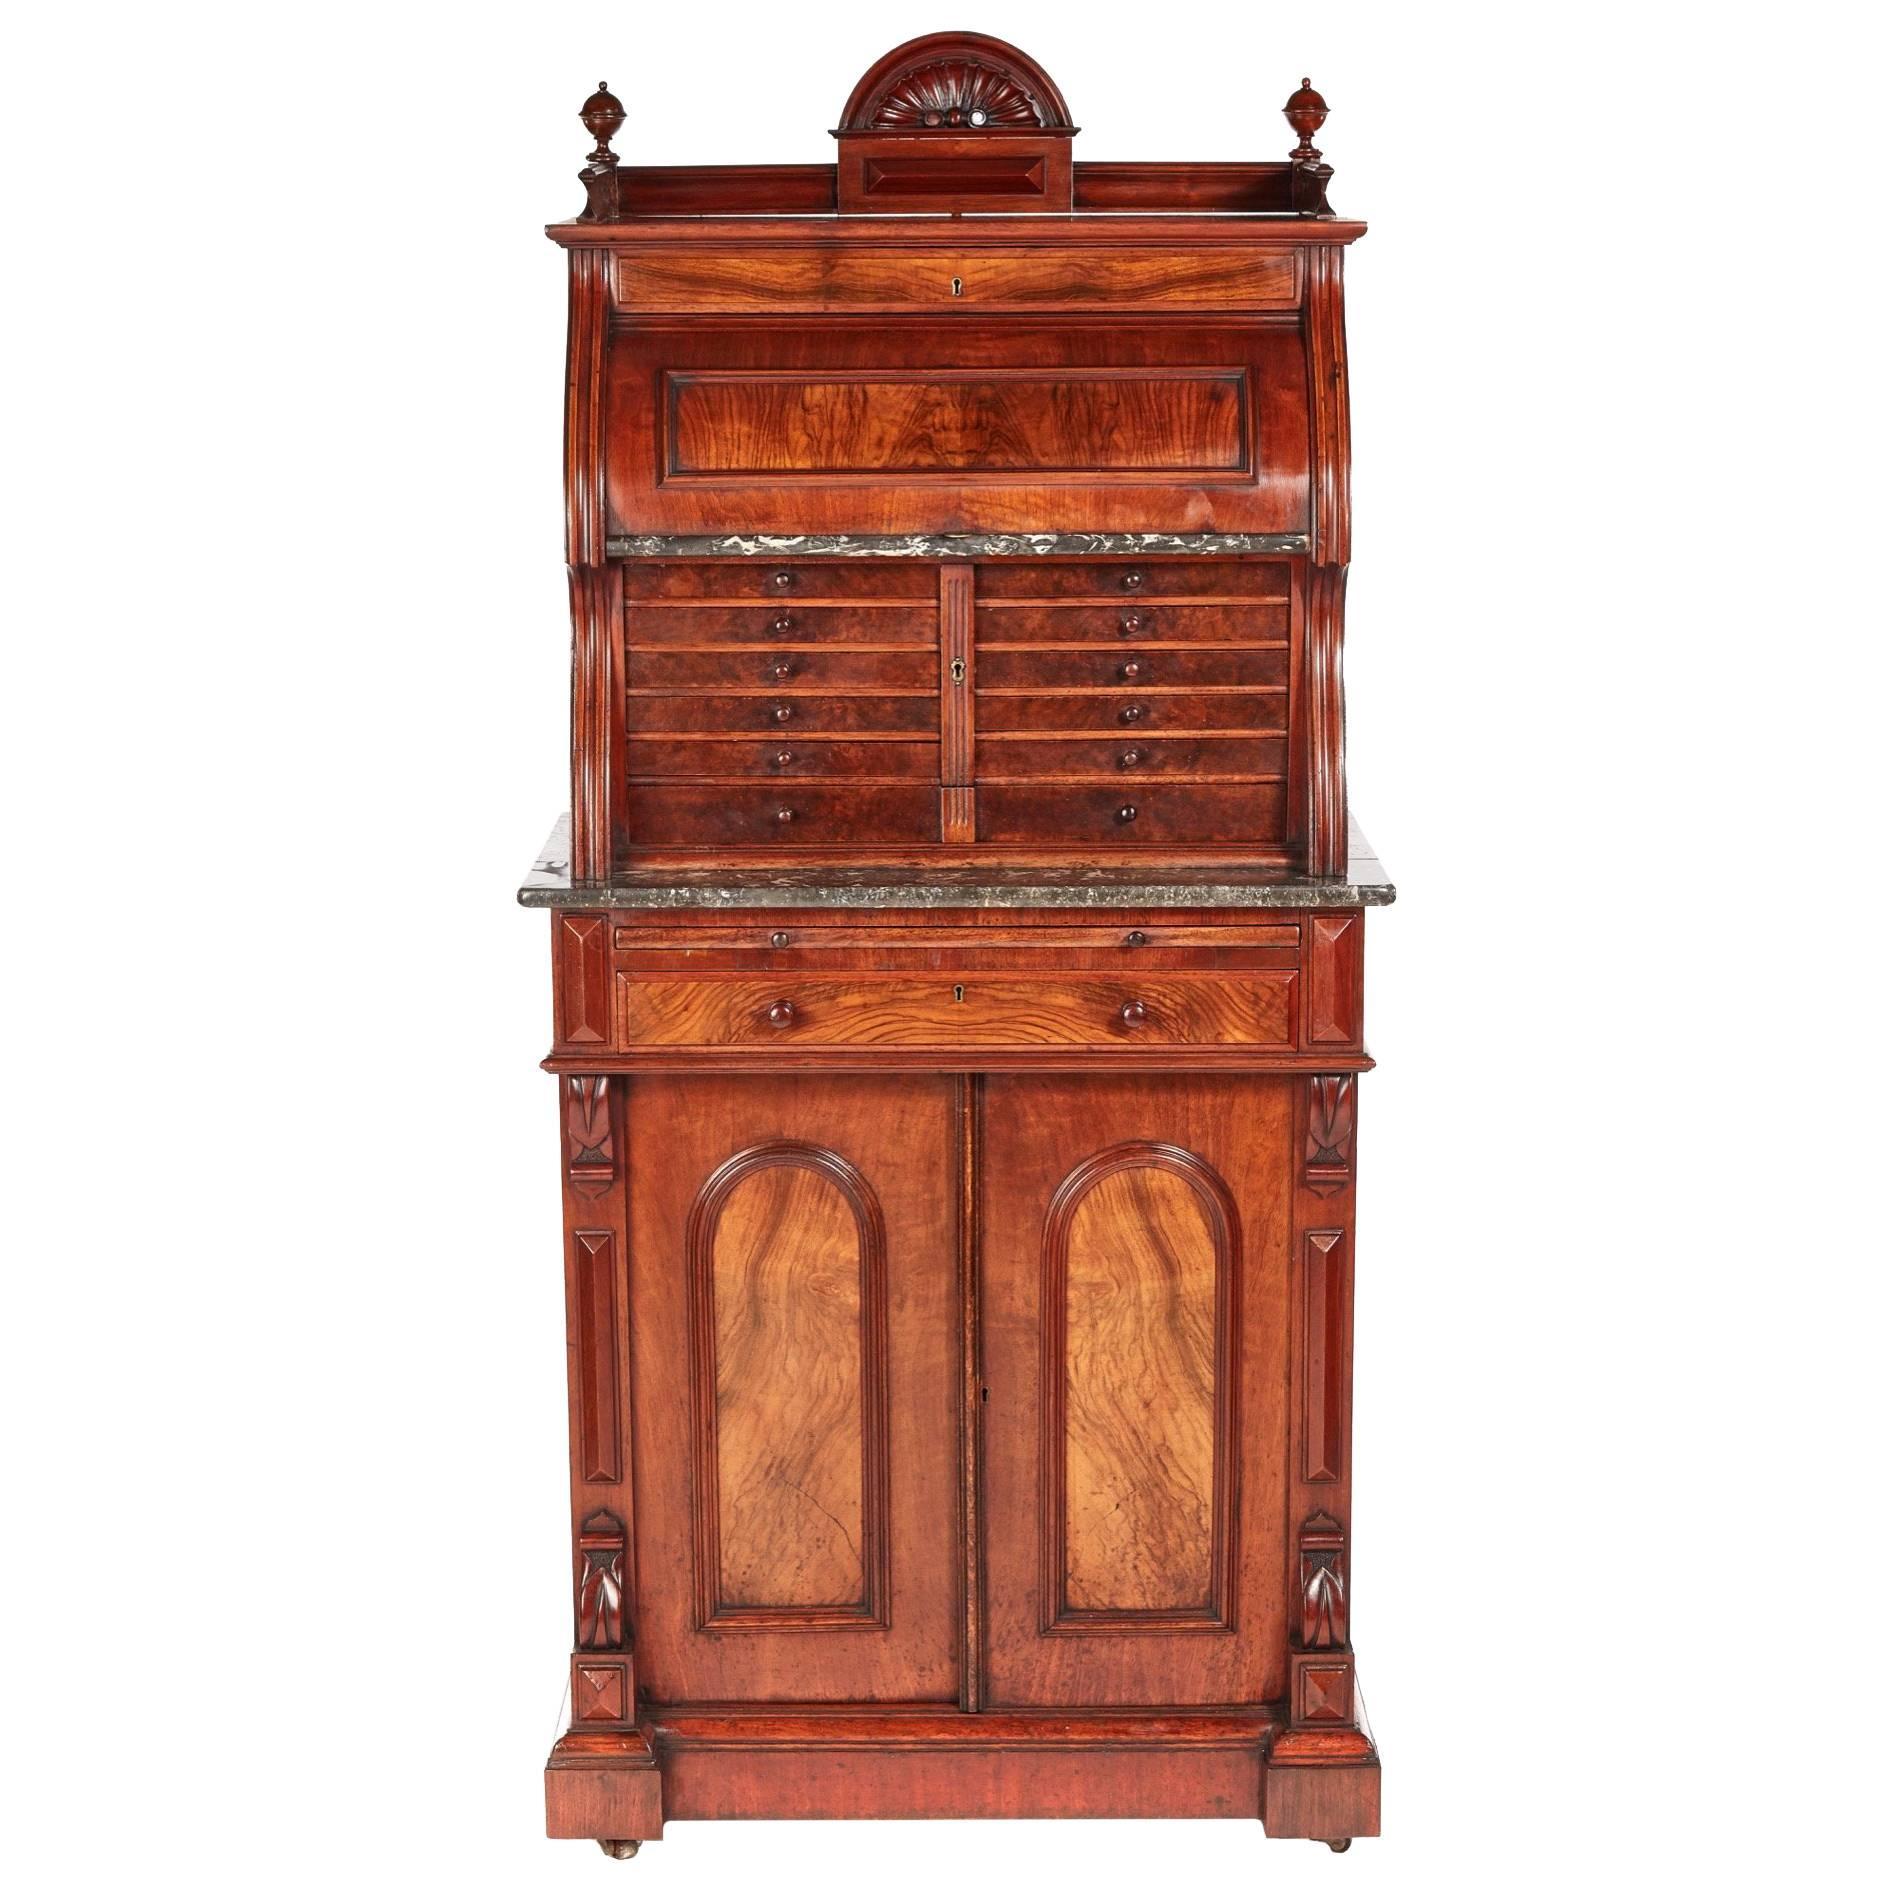 Fantastic Victorian Burr Walnut Dentist Cabinet For Sale at 1stdibs